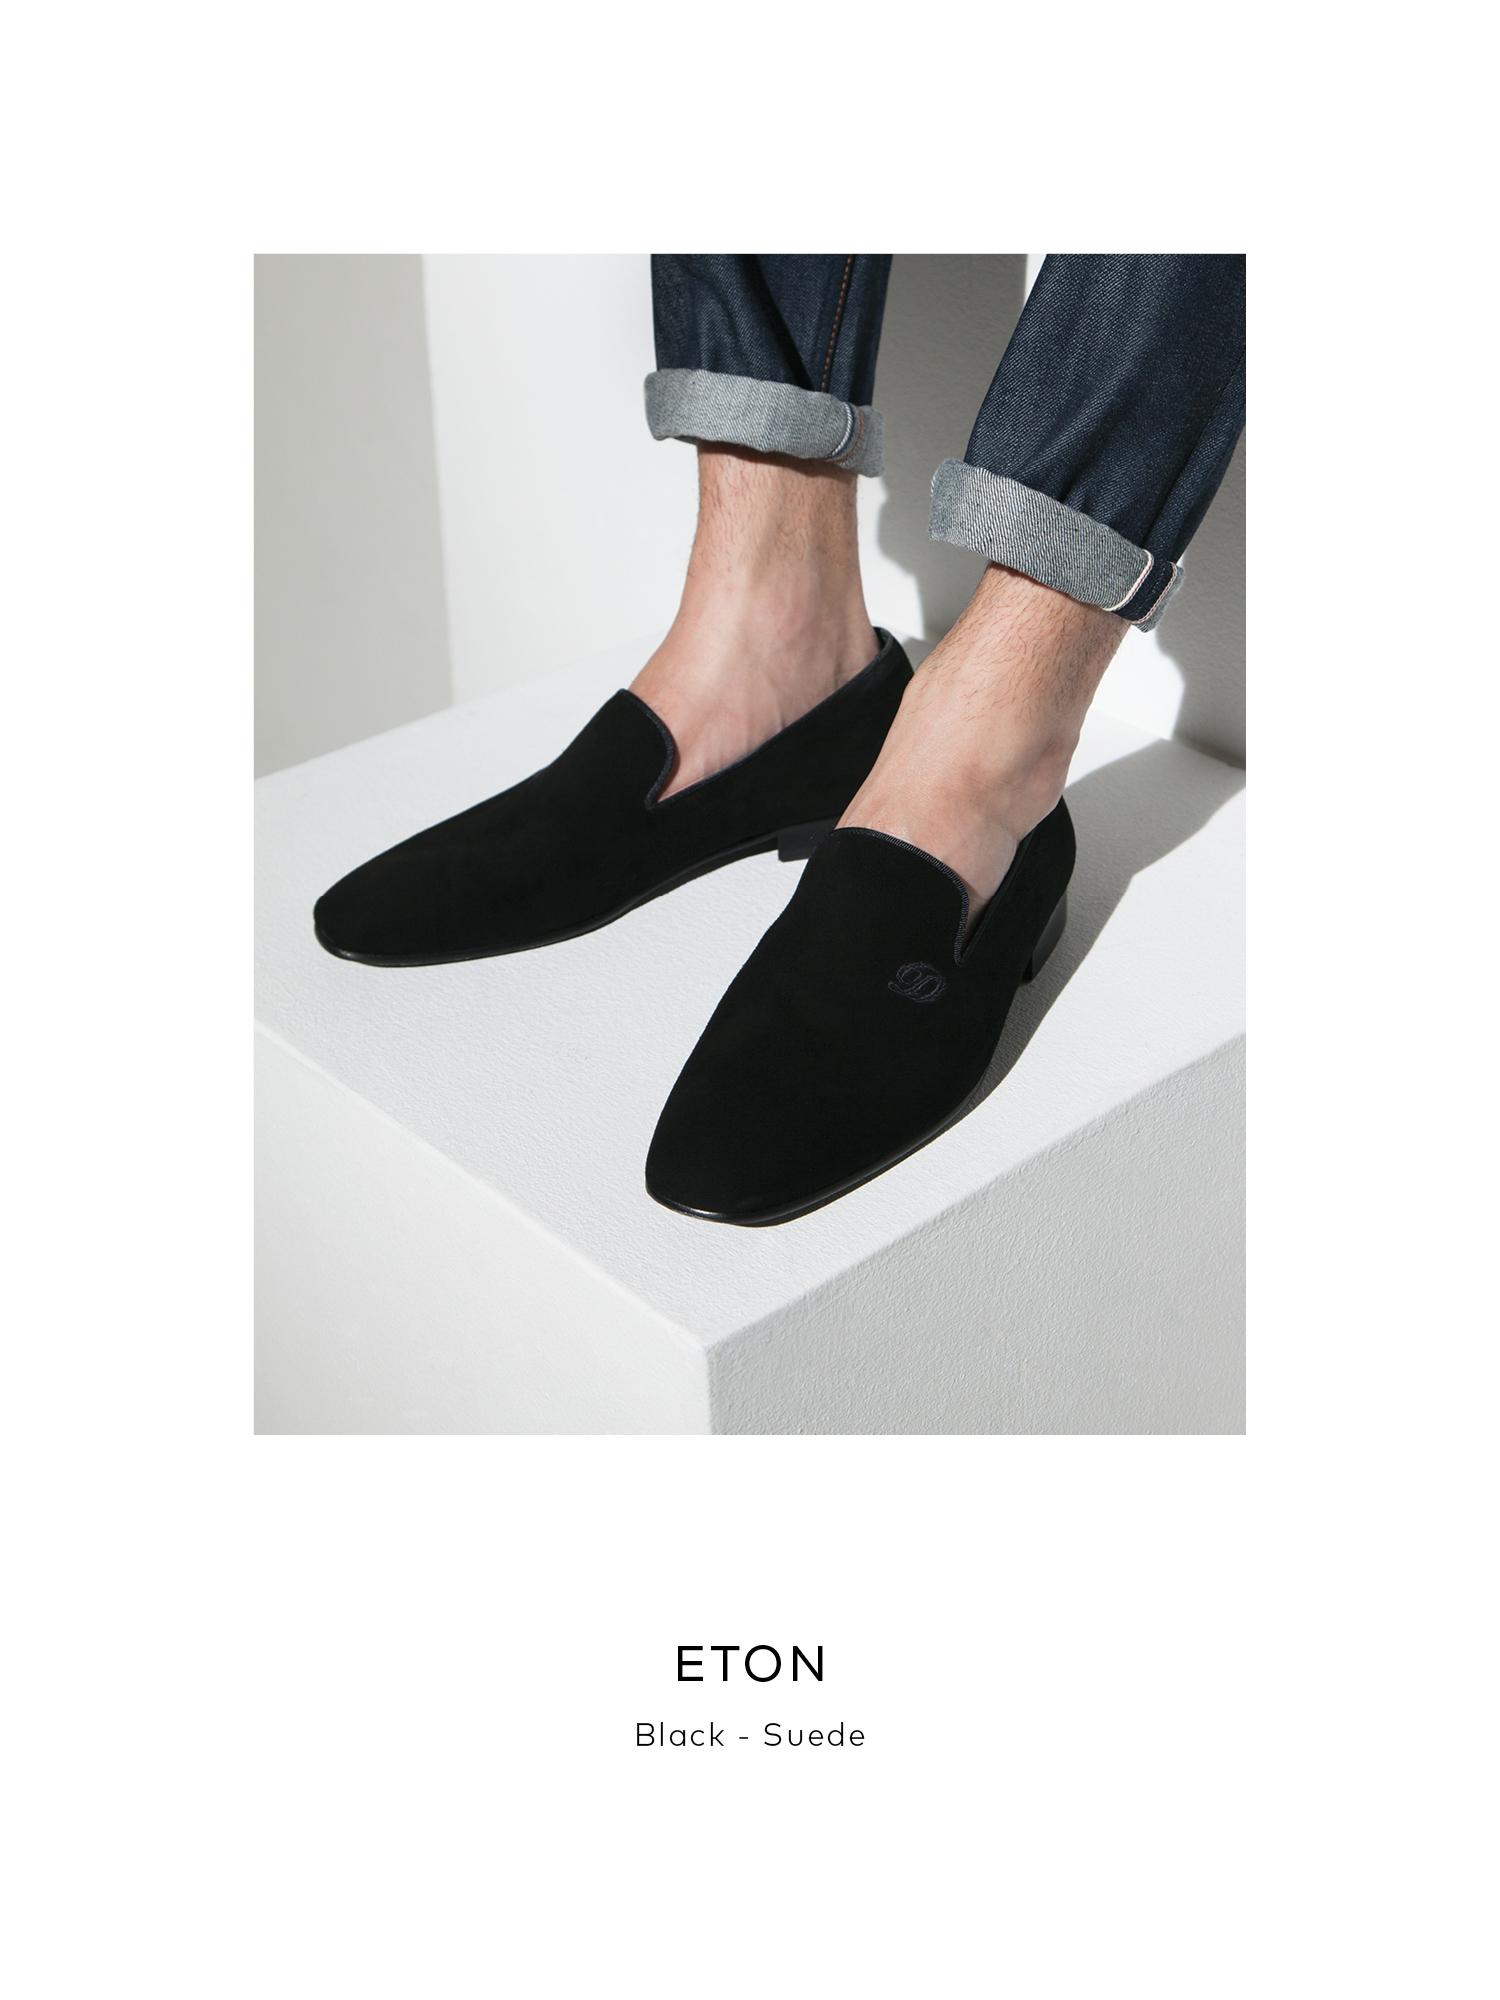 Eton, Black - Suede